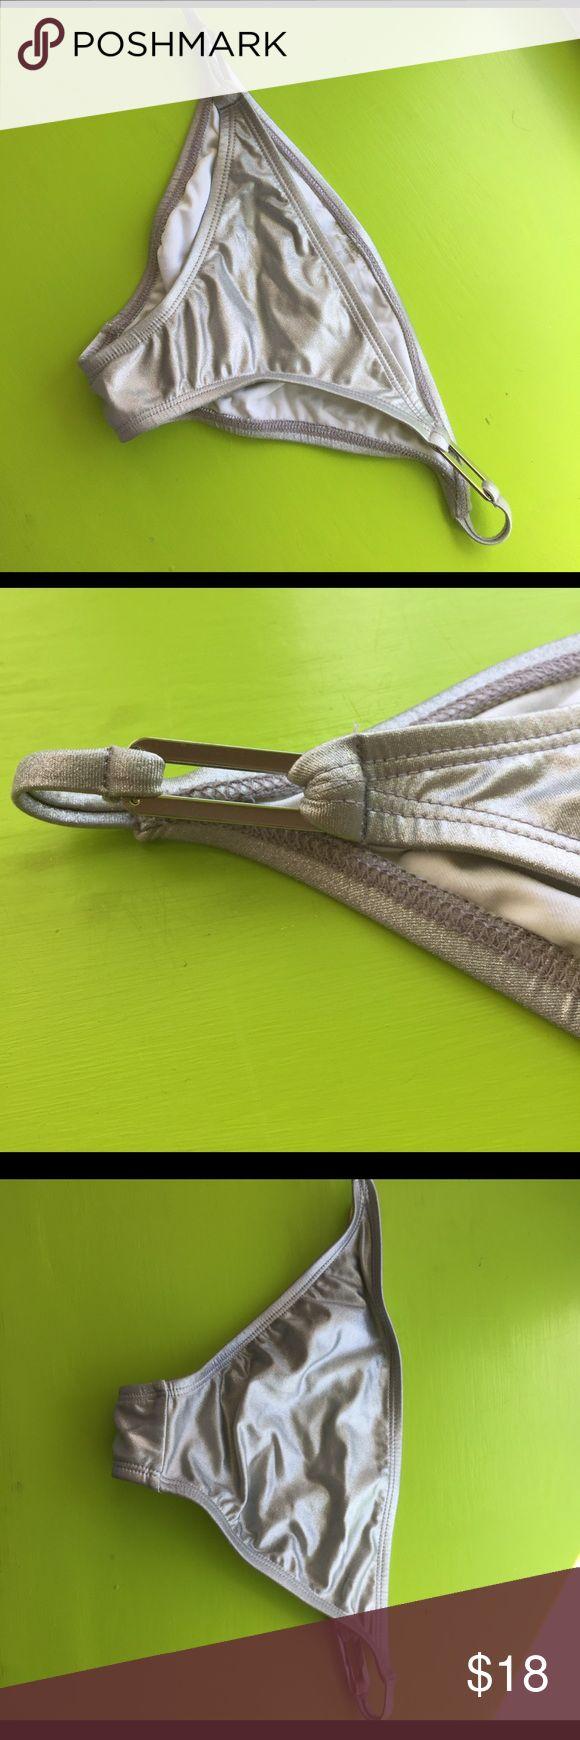 Silver bikini bottoms Silver Bebe sport bikini bottoms. Size small. Silver metal rectangles on both sides of hip. Very cute. Never worn because too small for me bebe Swim Bikinis